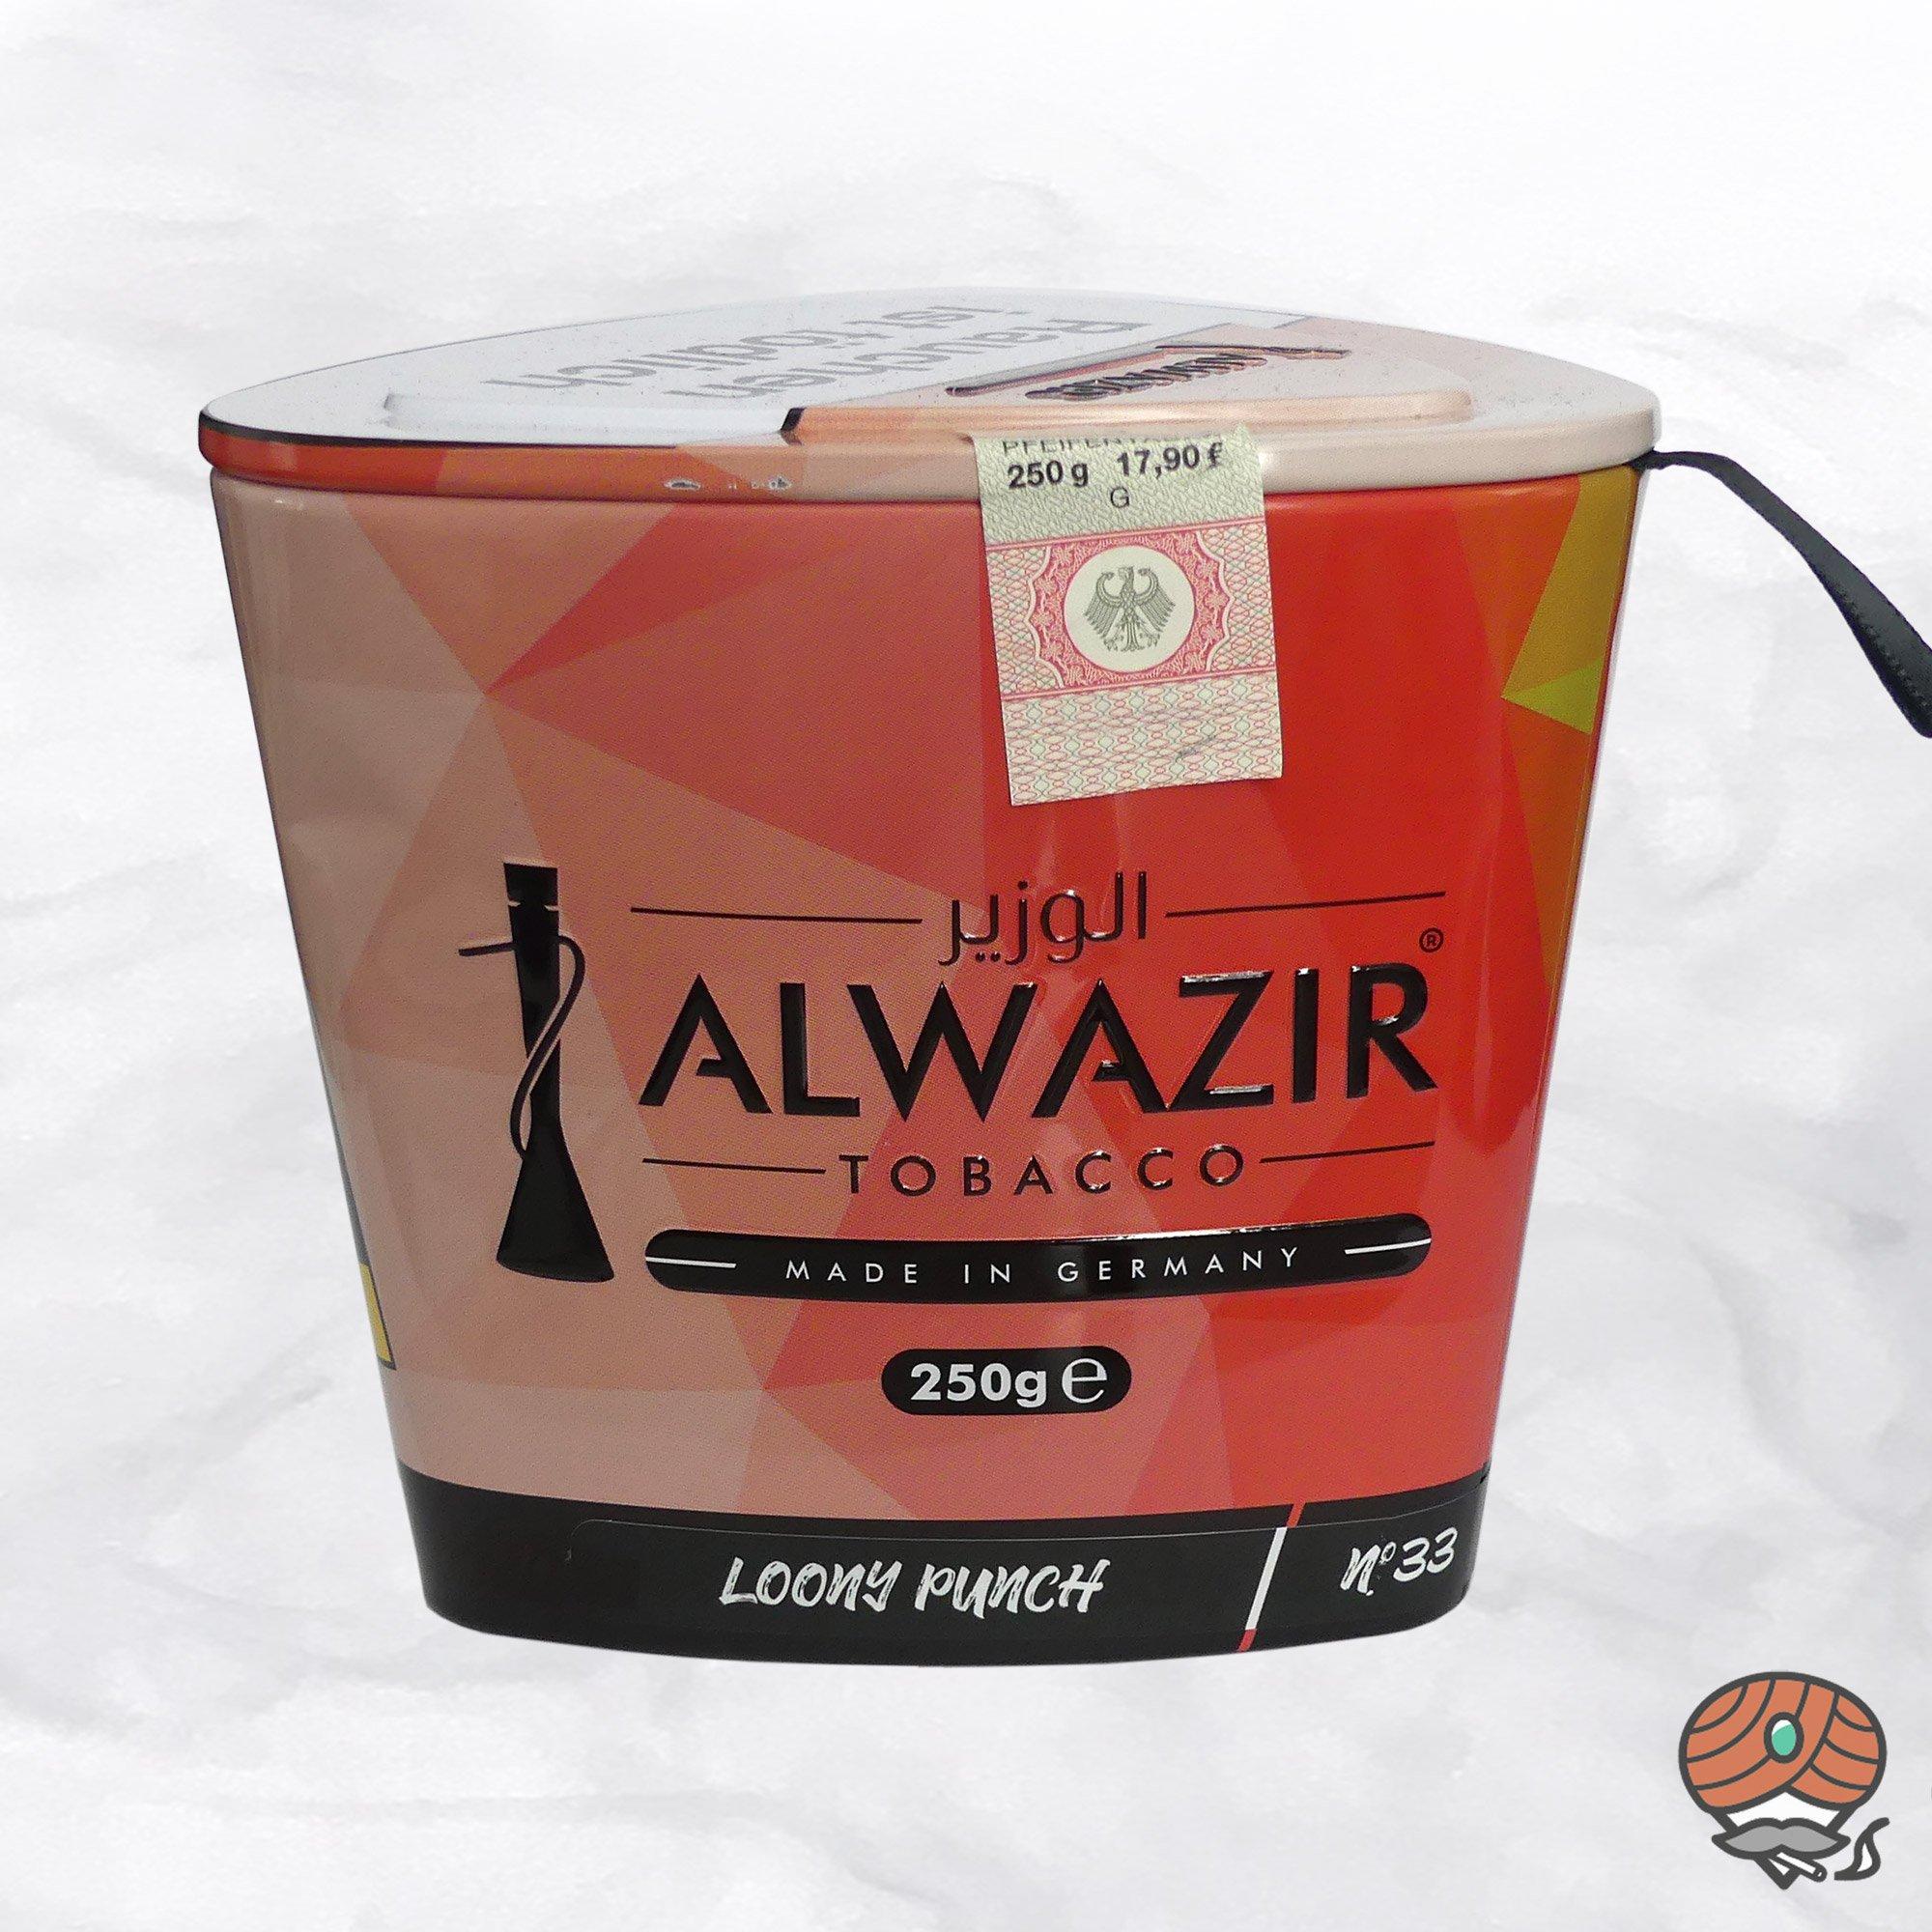 Alwazir Shisha Tabak - No. 33 - LOONY PUNCH 250g